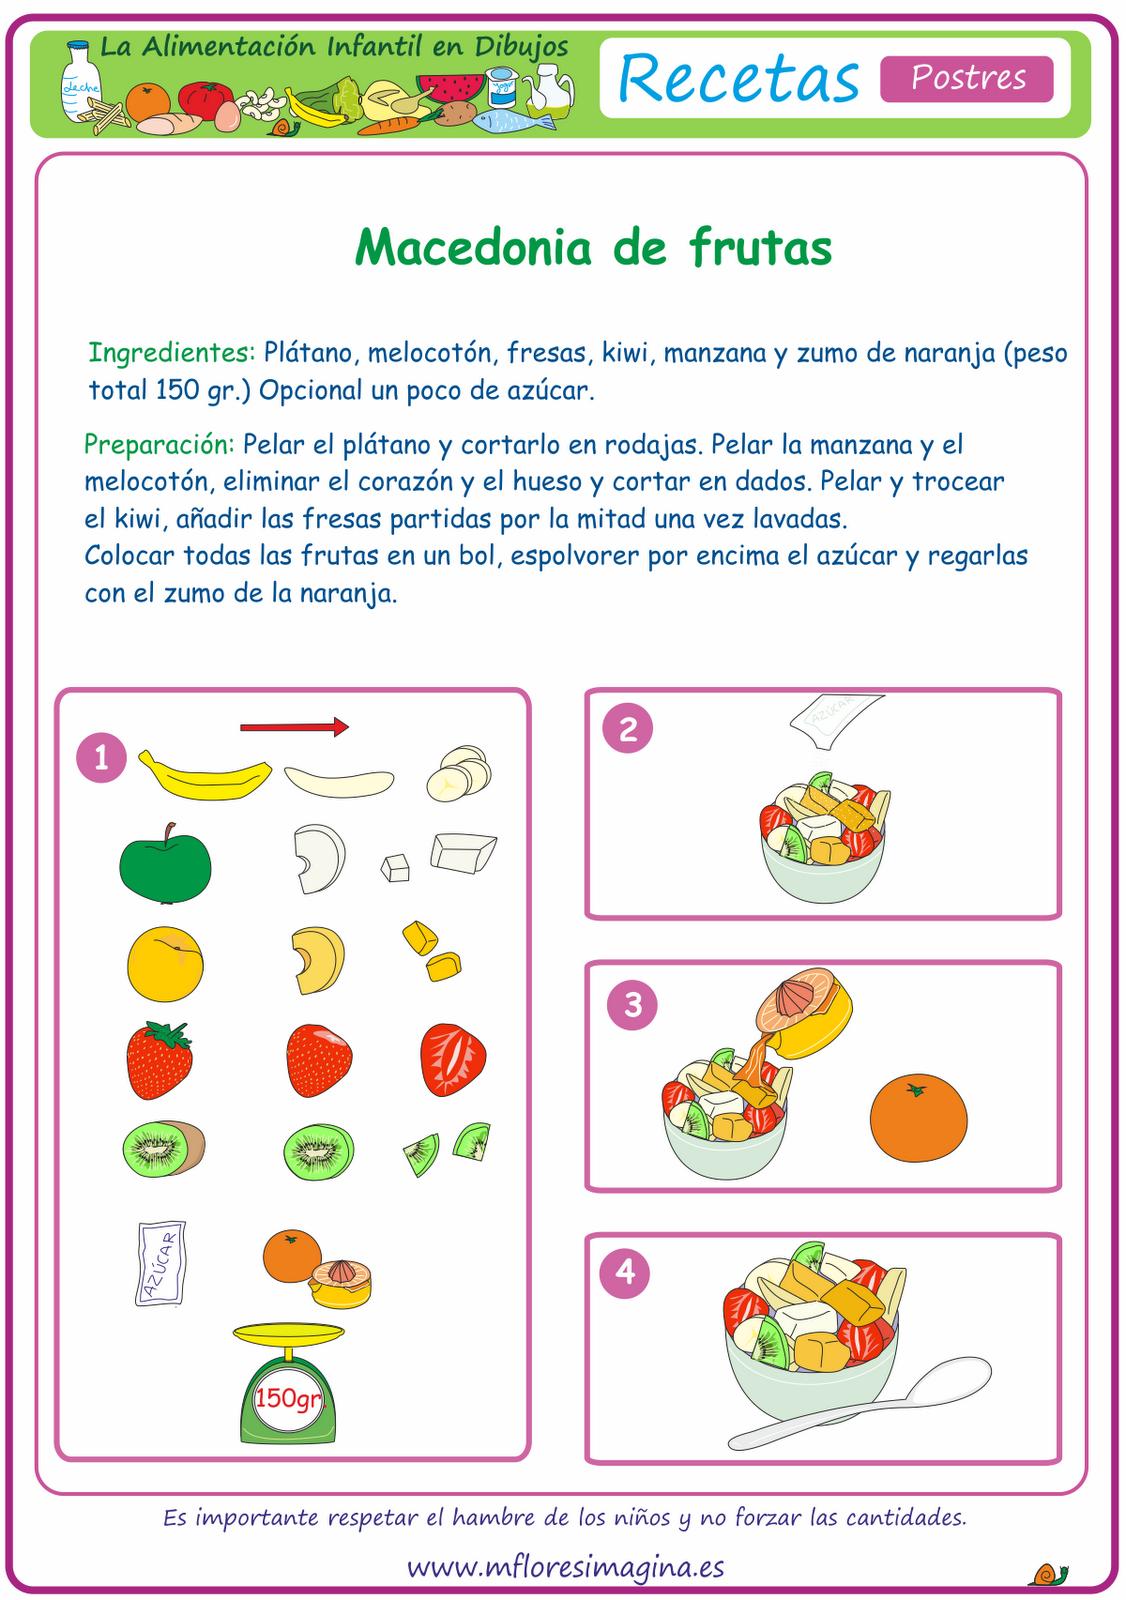 La alimentaci n infantil en dibujos postres for Dibujos sobre cocina